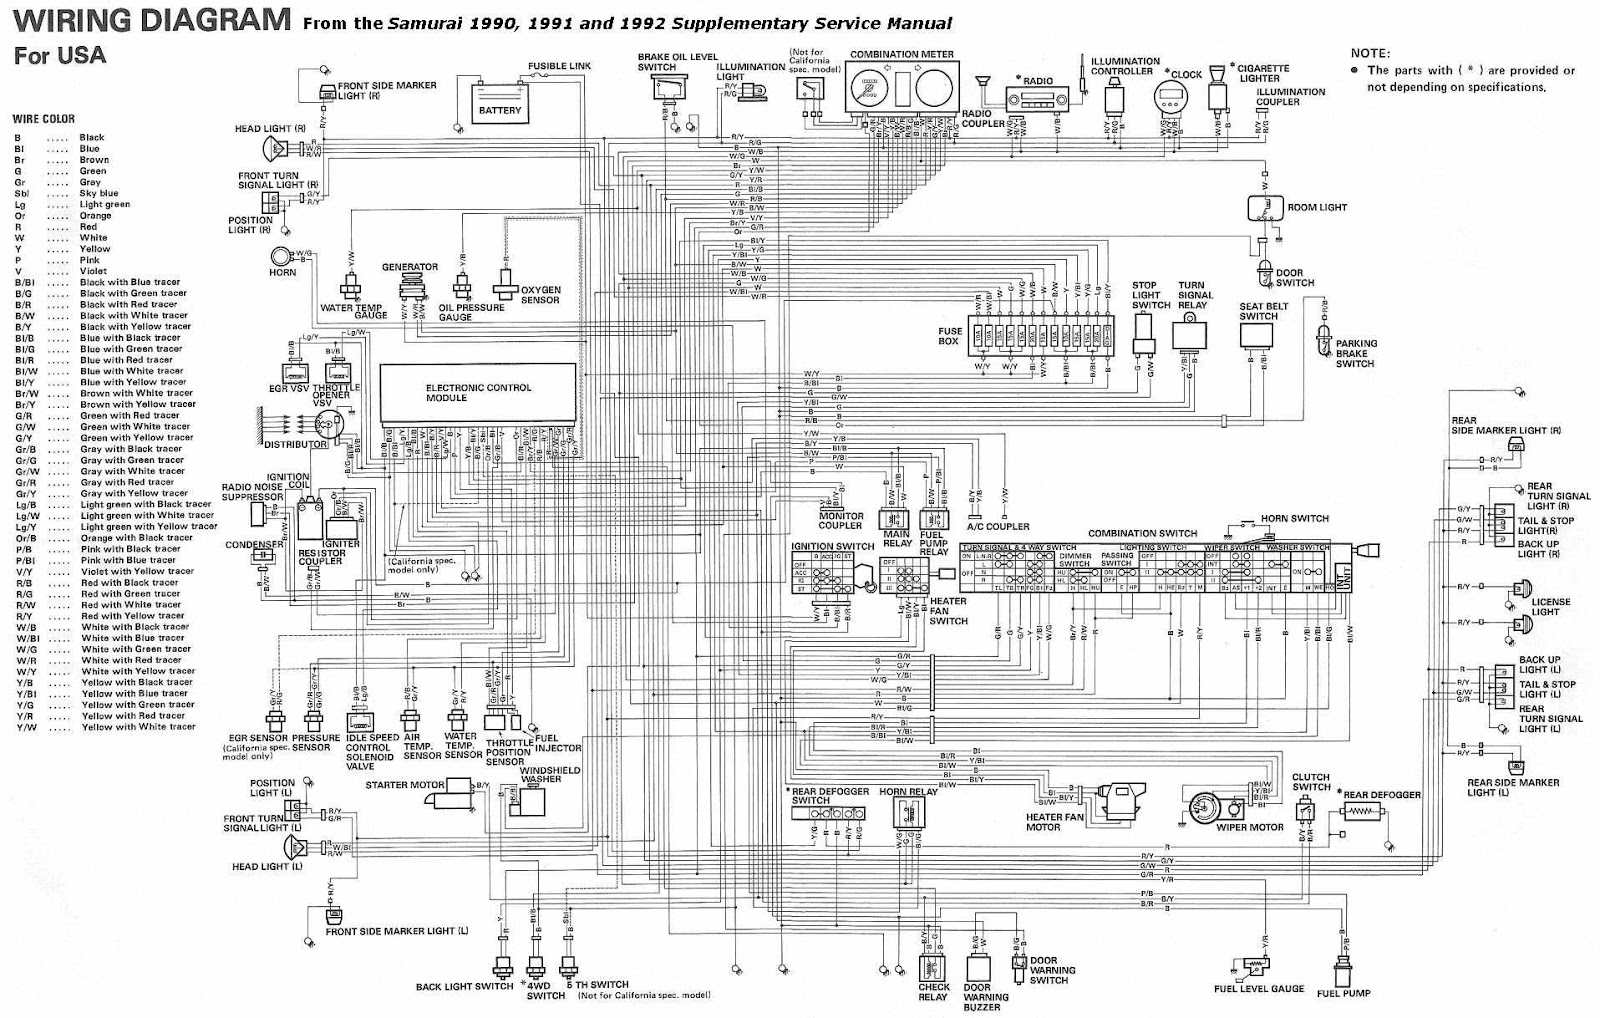 1986 suzuki samurai wiring diagram wiring diagram symbols suzuki 1600 wiring-diagram suzuki samurai alternator wiring diagram #8